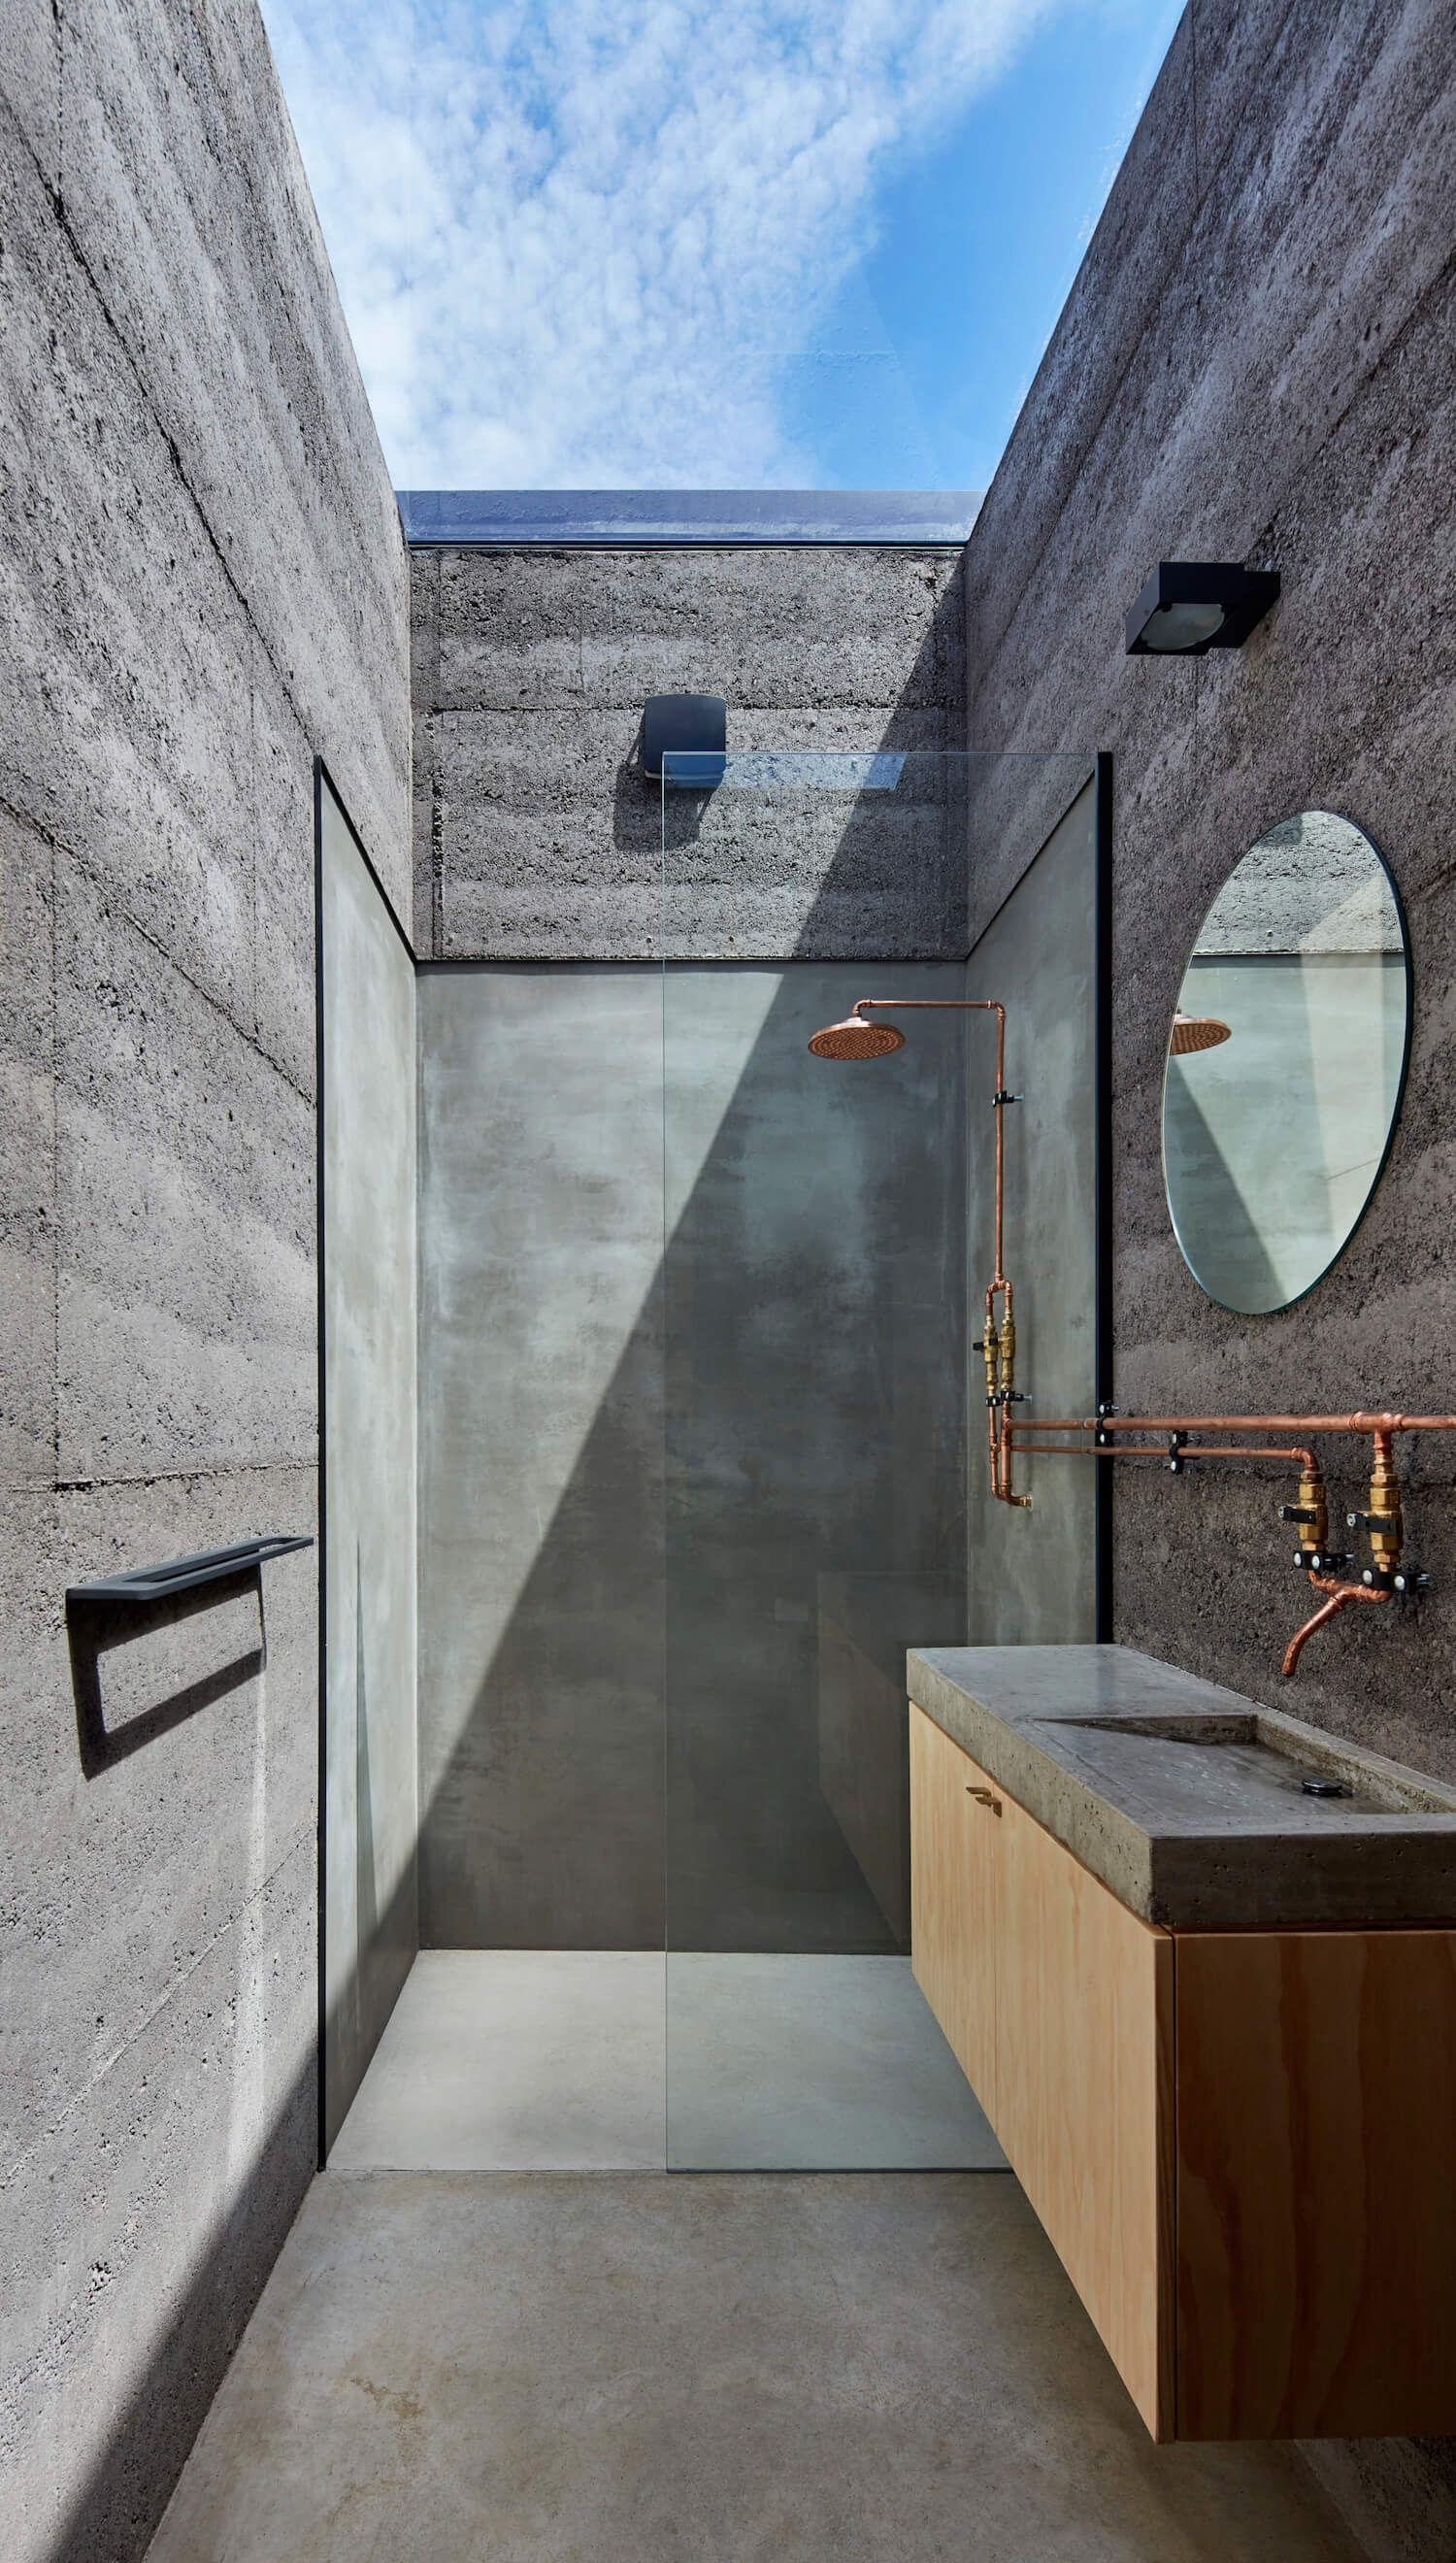 Balnarring beauty bathroom design concrete bathroom with sky light minimal house design house architecture home design interior design exterior design